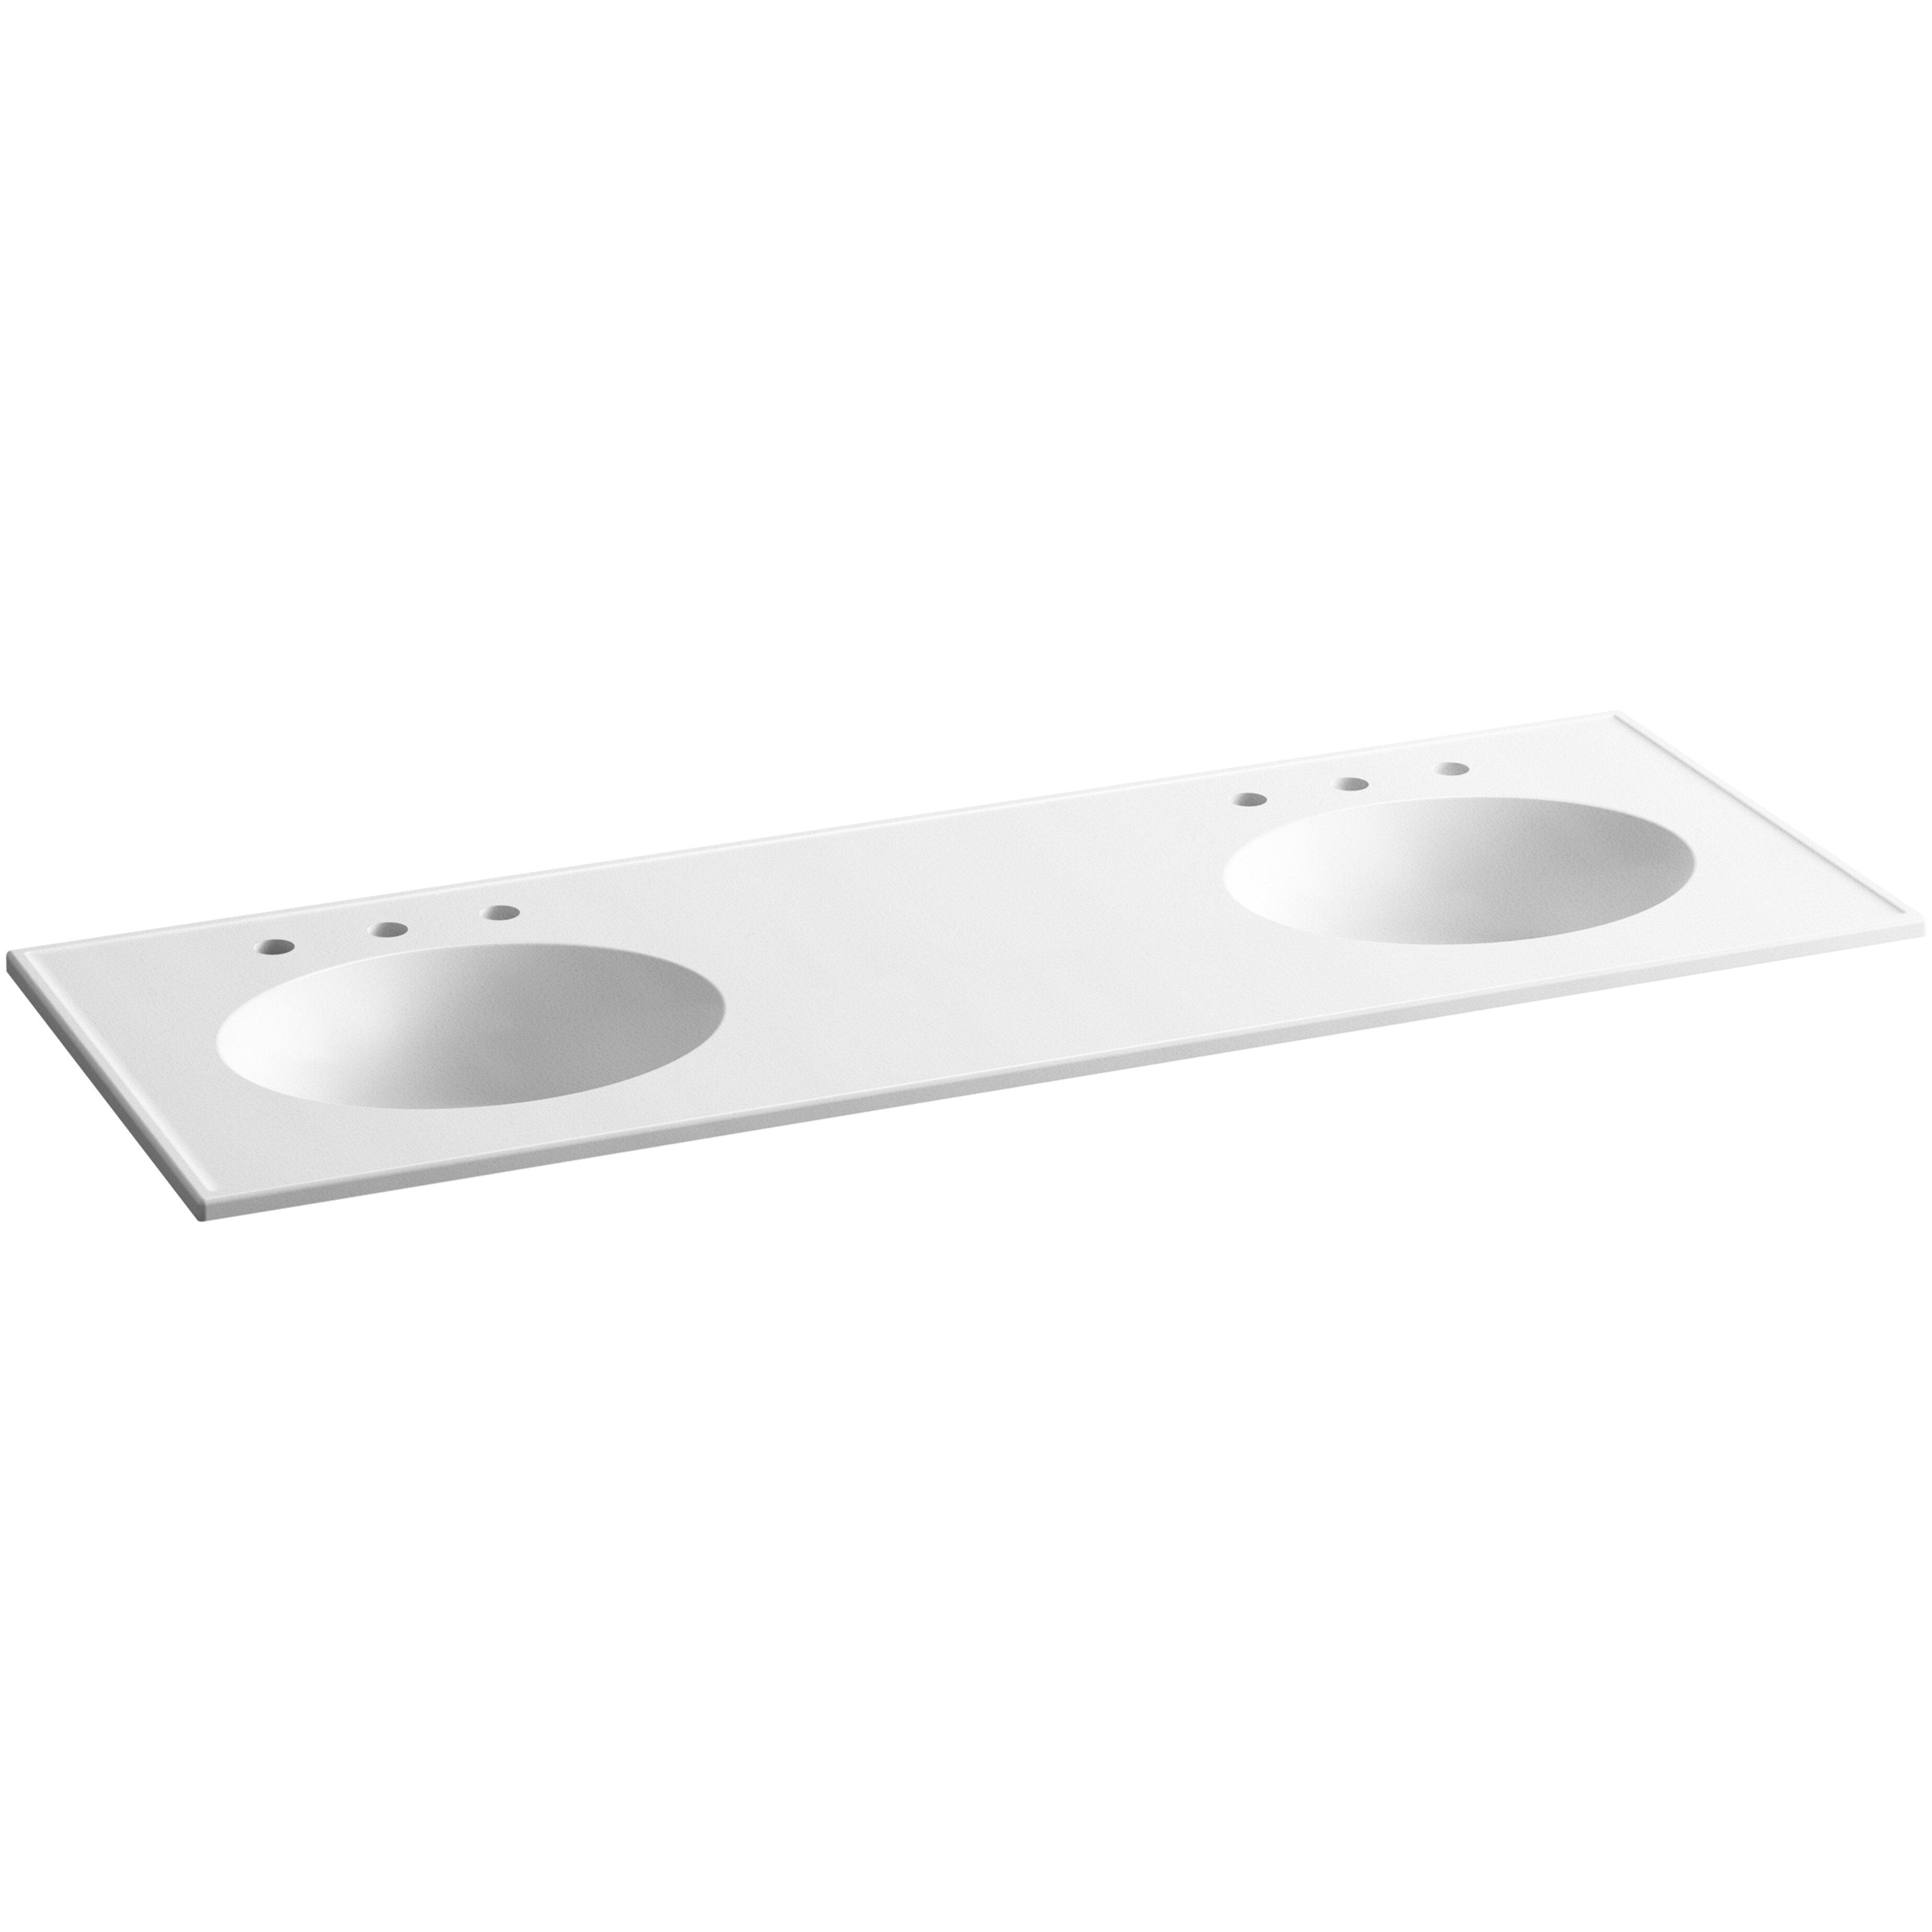 "Kohler Double Bathroom Sink: Ceramic/Impressions 61"" Oval Double-Bowl Vanity-Top"